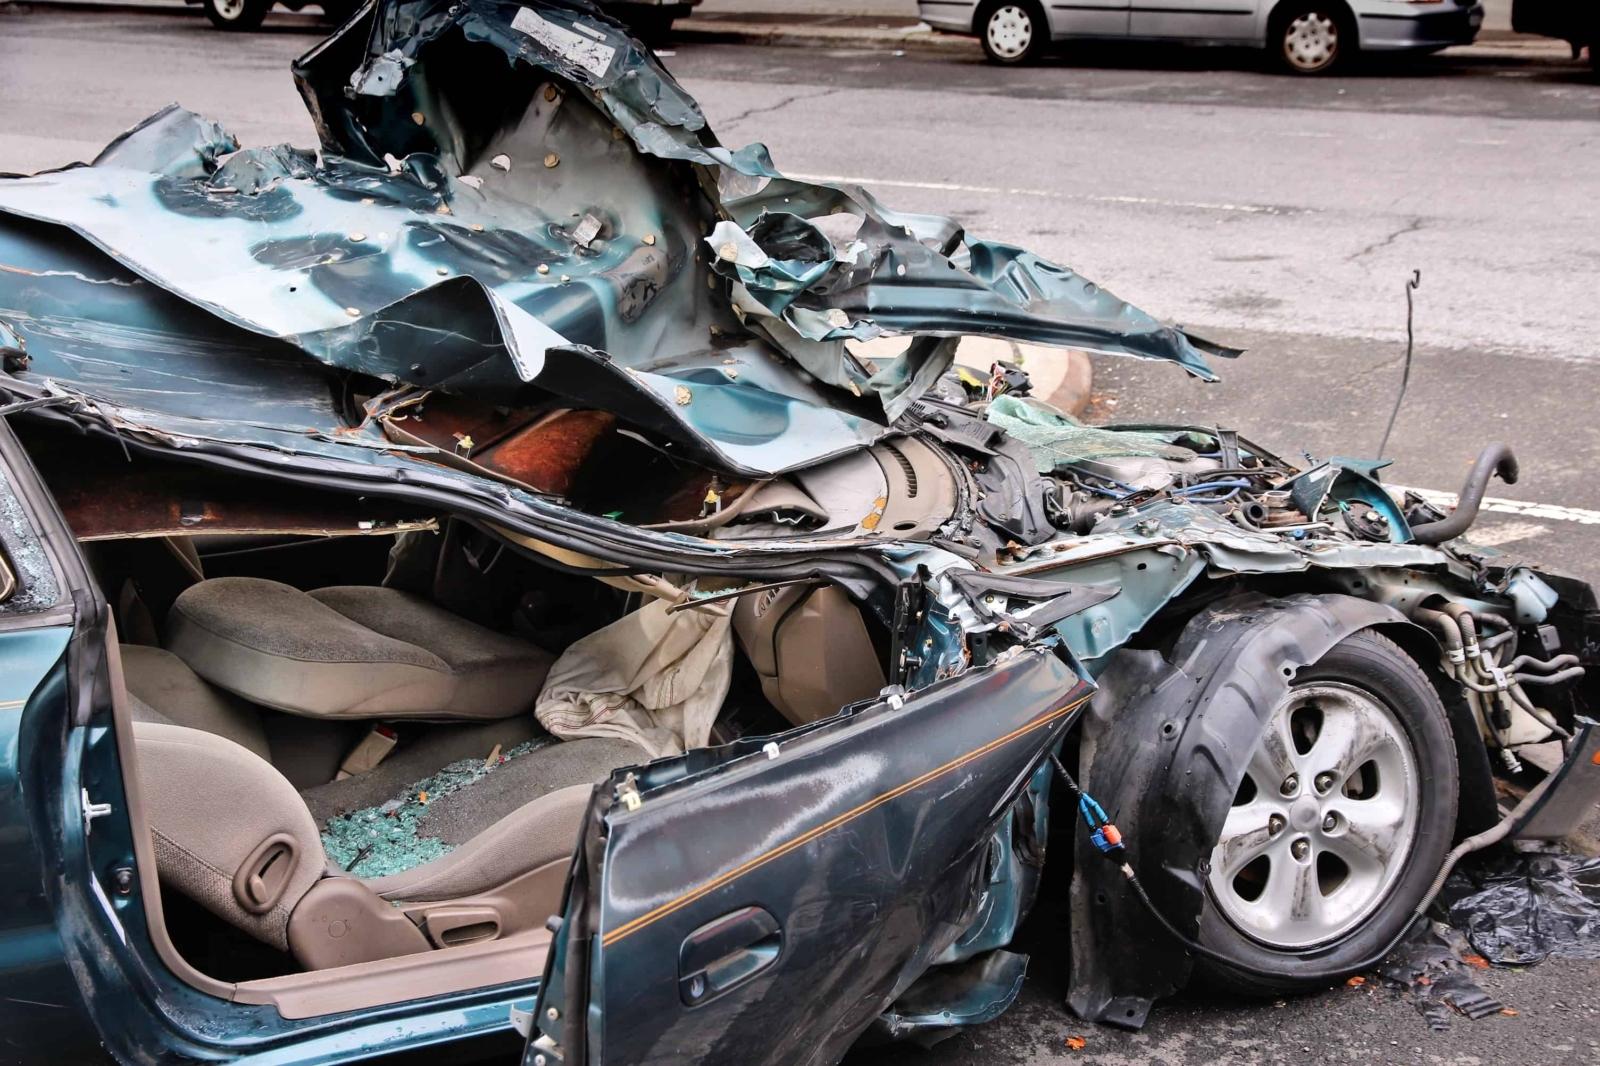 Woman Dies in Rollover Crash on Highway 1 [Marina, CA]